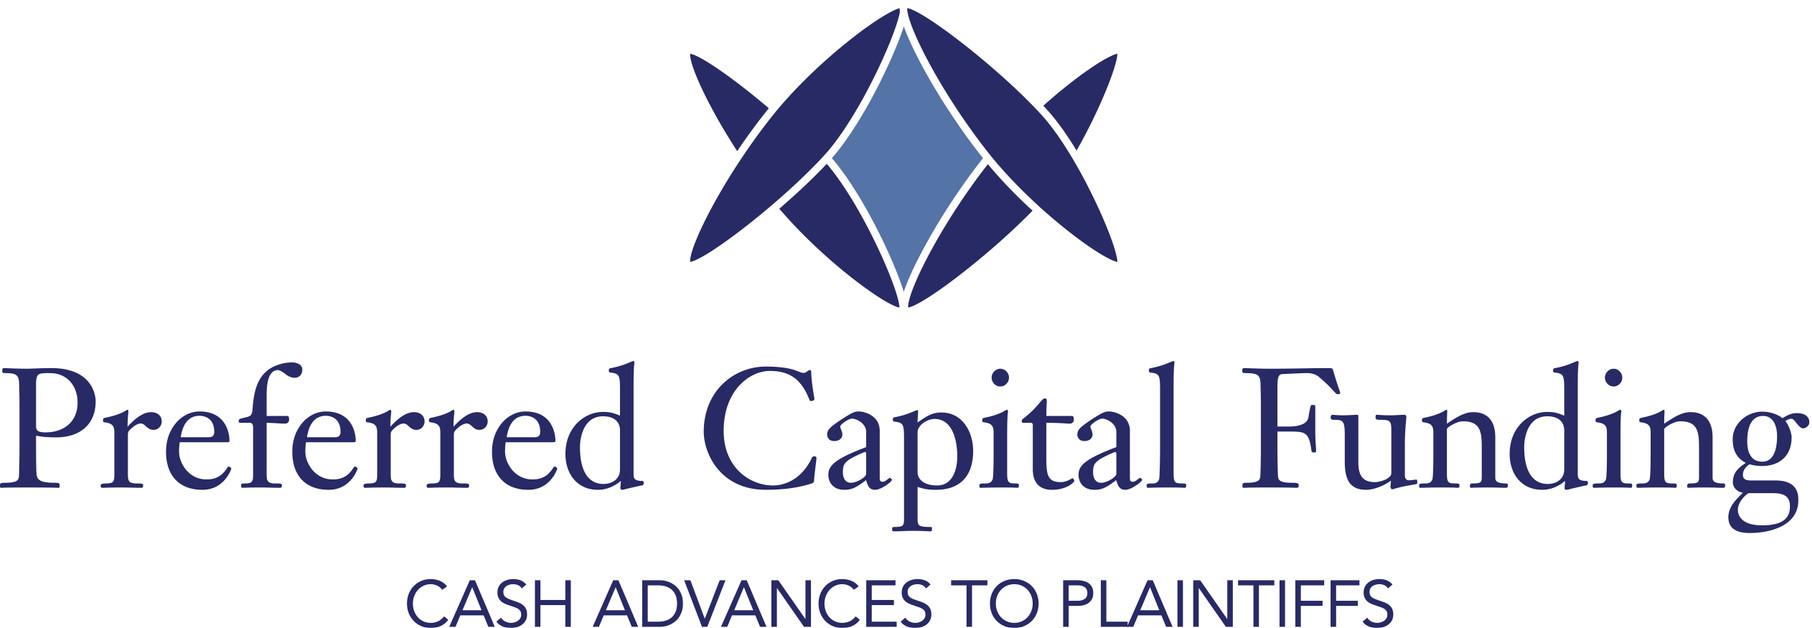 Preferred Capital Funding